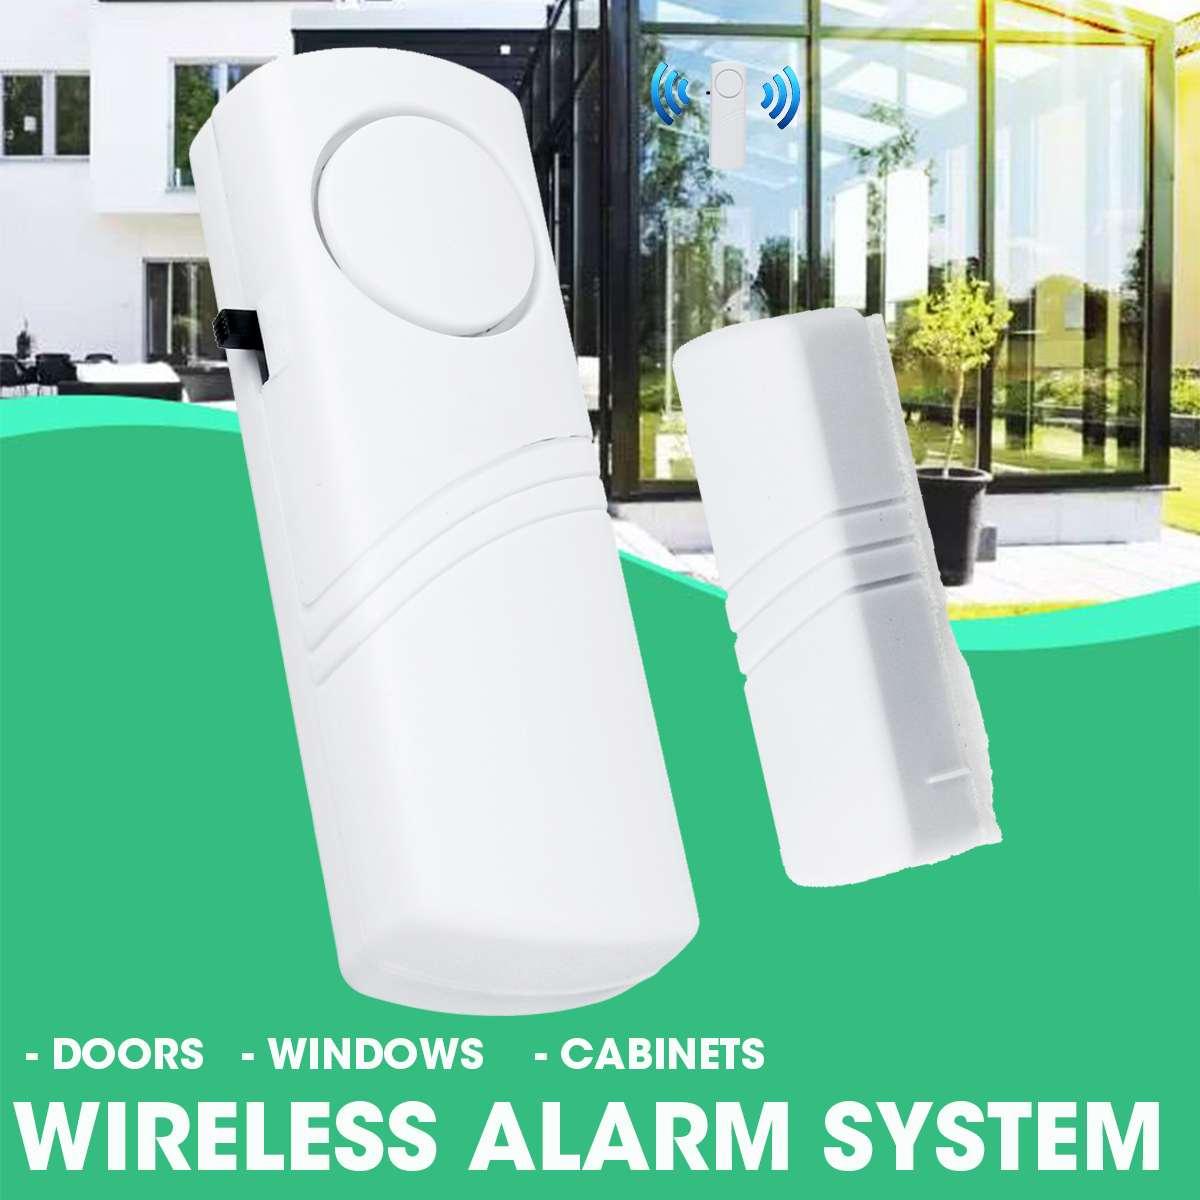 Wireless Burglar Alert With Magnetic Sensor Window Door Entry Anti Thief Home Alarm System Security Device 90DB